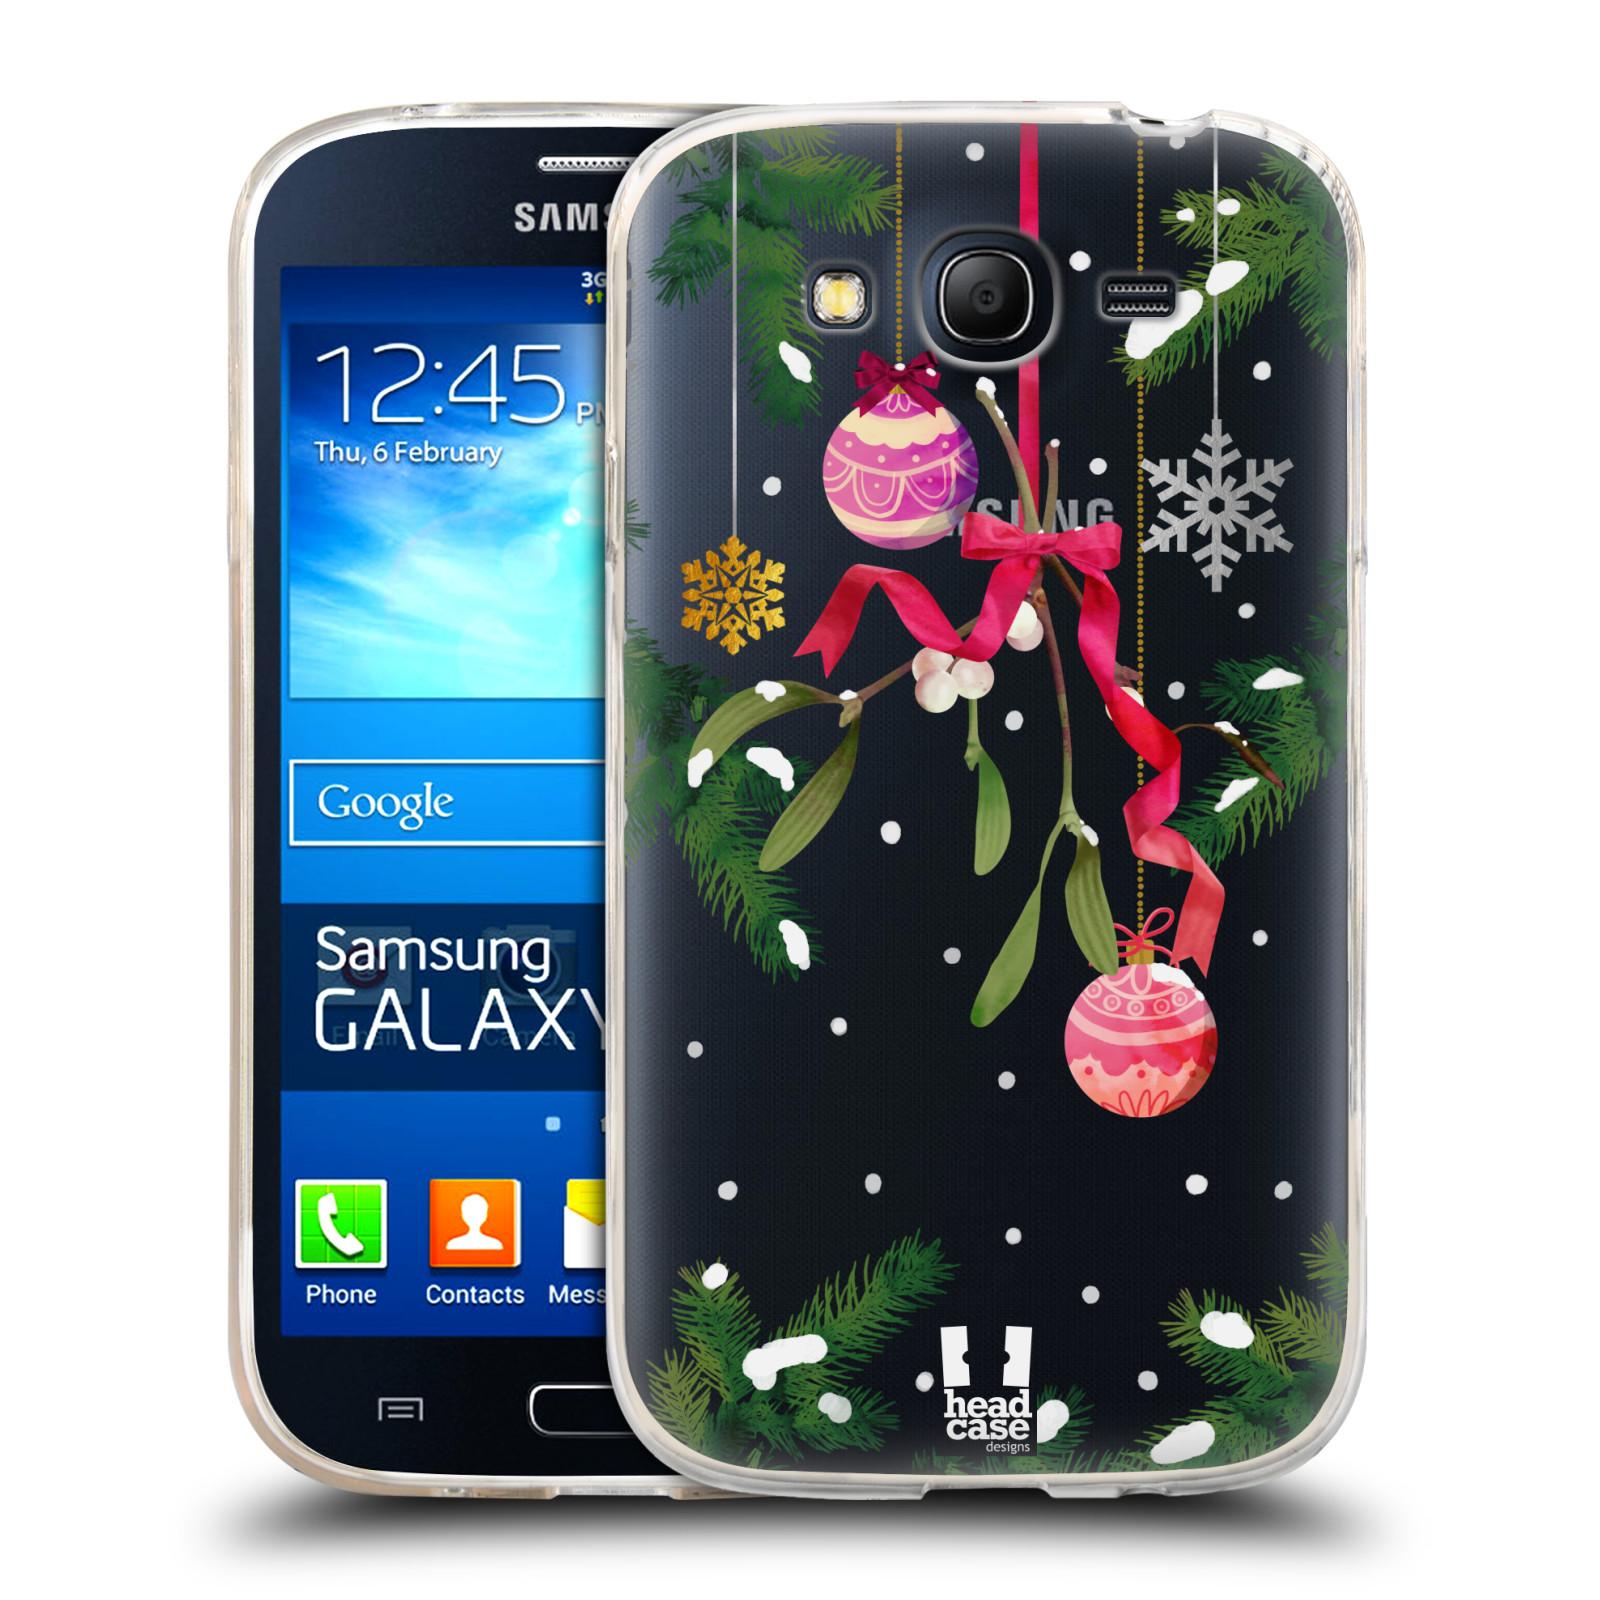 Silikonové pouzdro na mobil Samsung Galaxy Grand Neo - Head Case - Větvičky a vánoční ozdoby